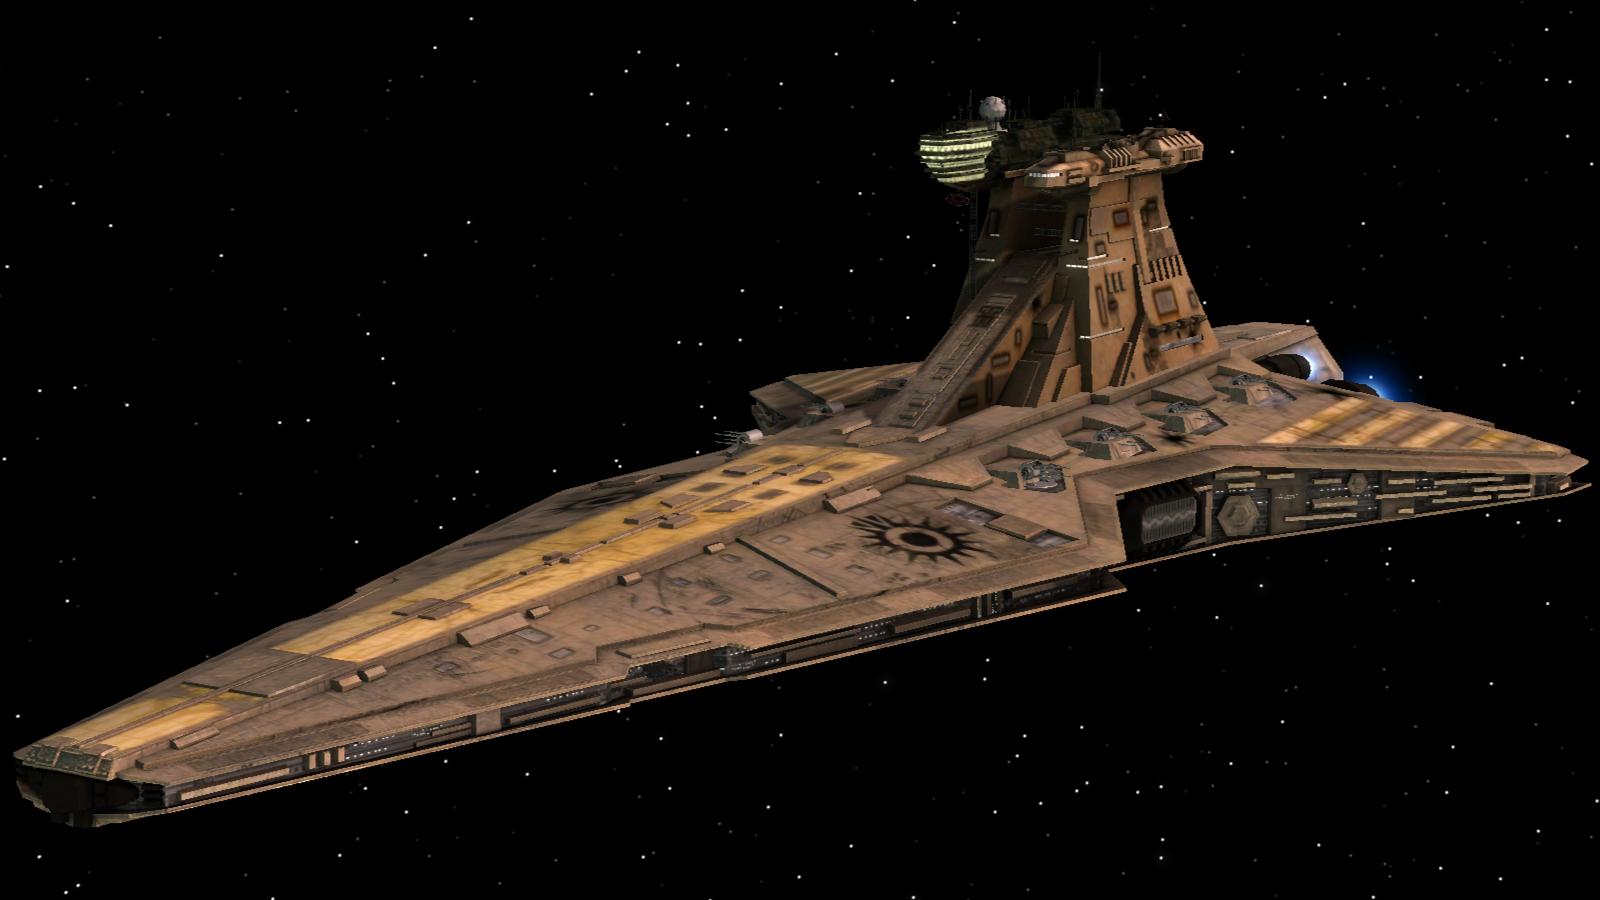 Venator Class Star Destroyer Black Sun Awakening Of The